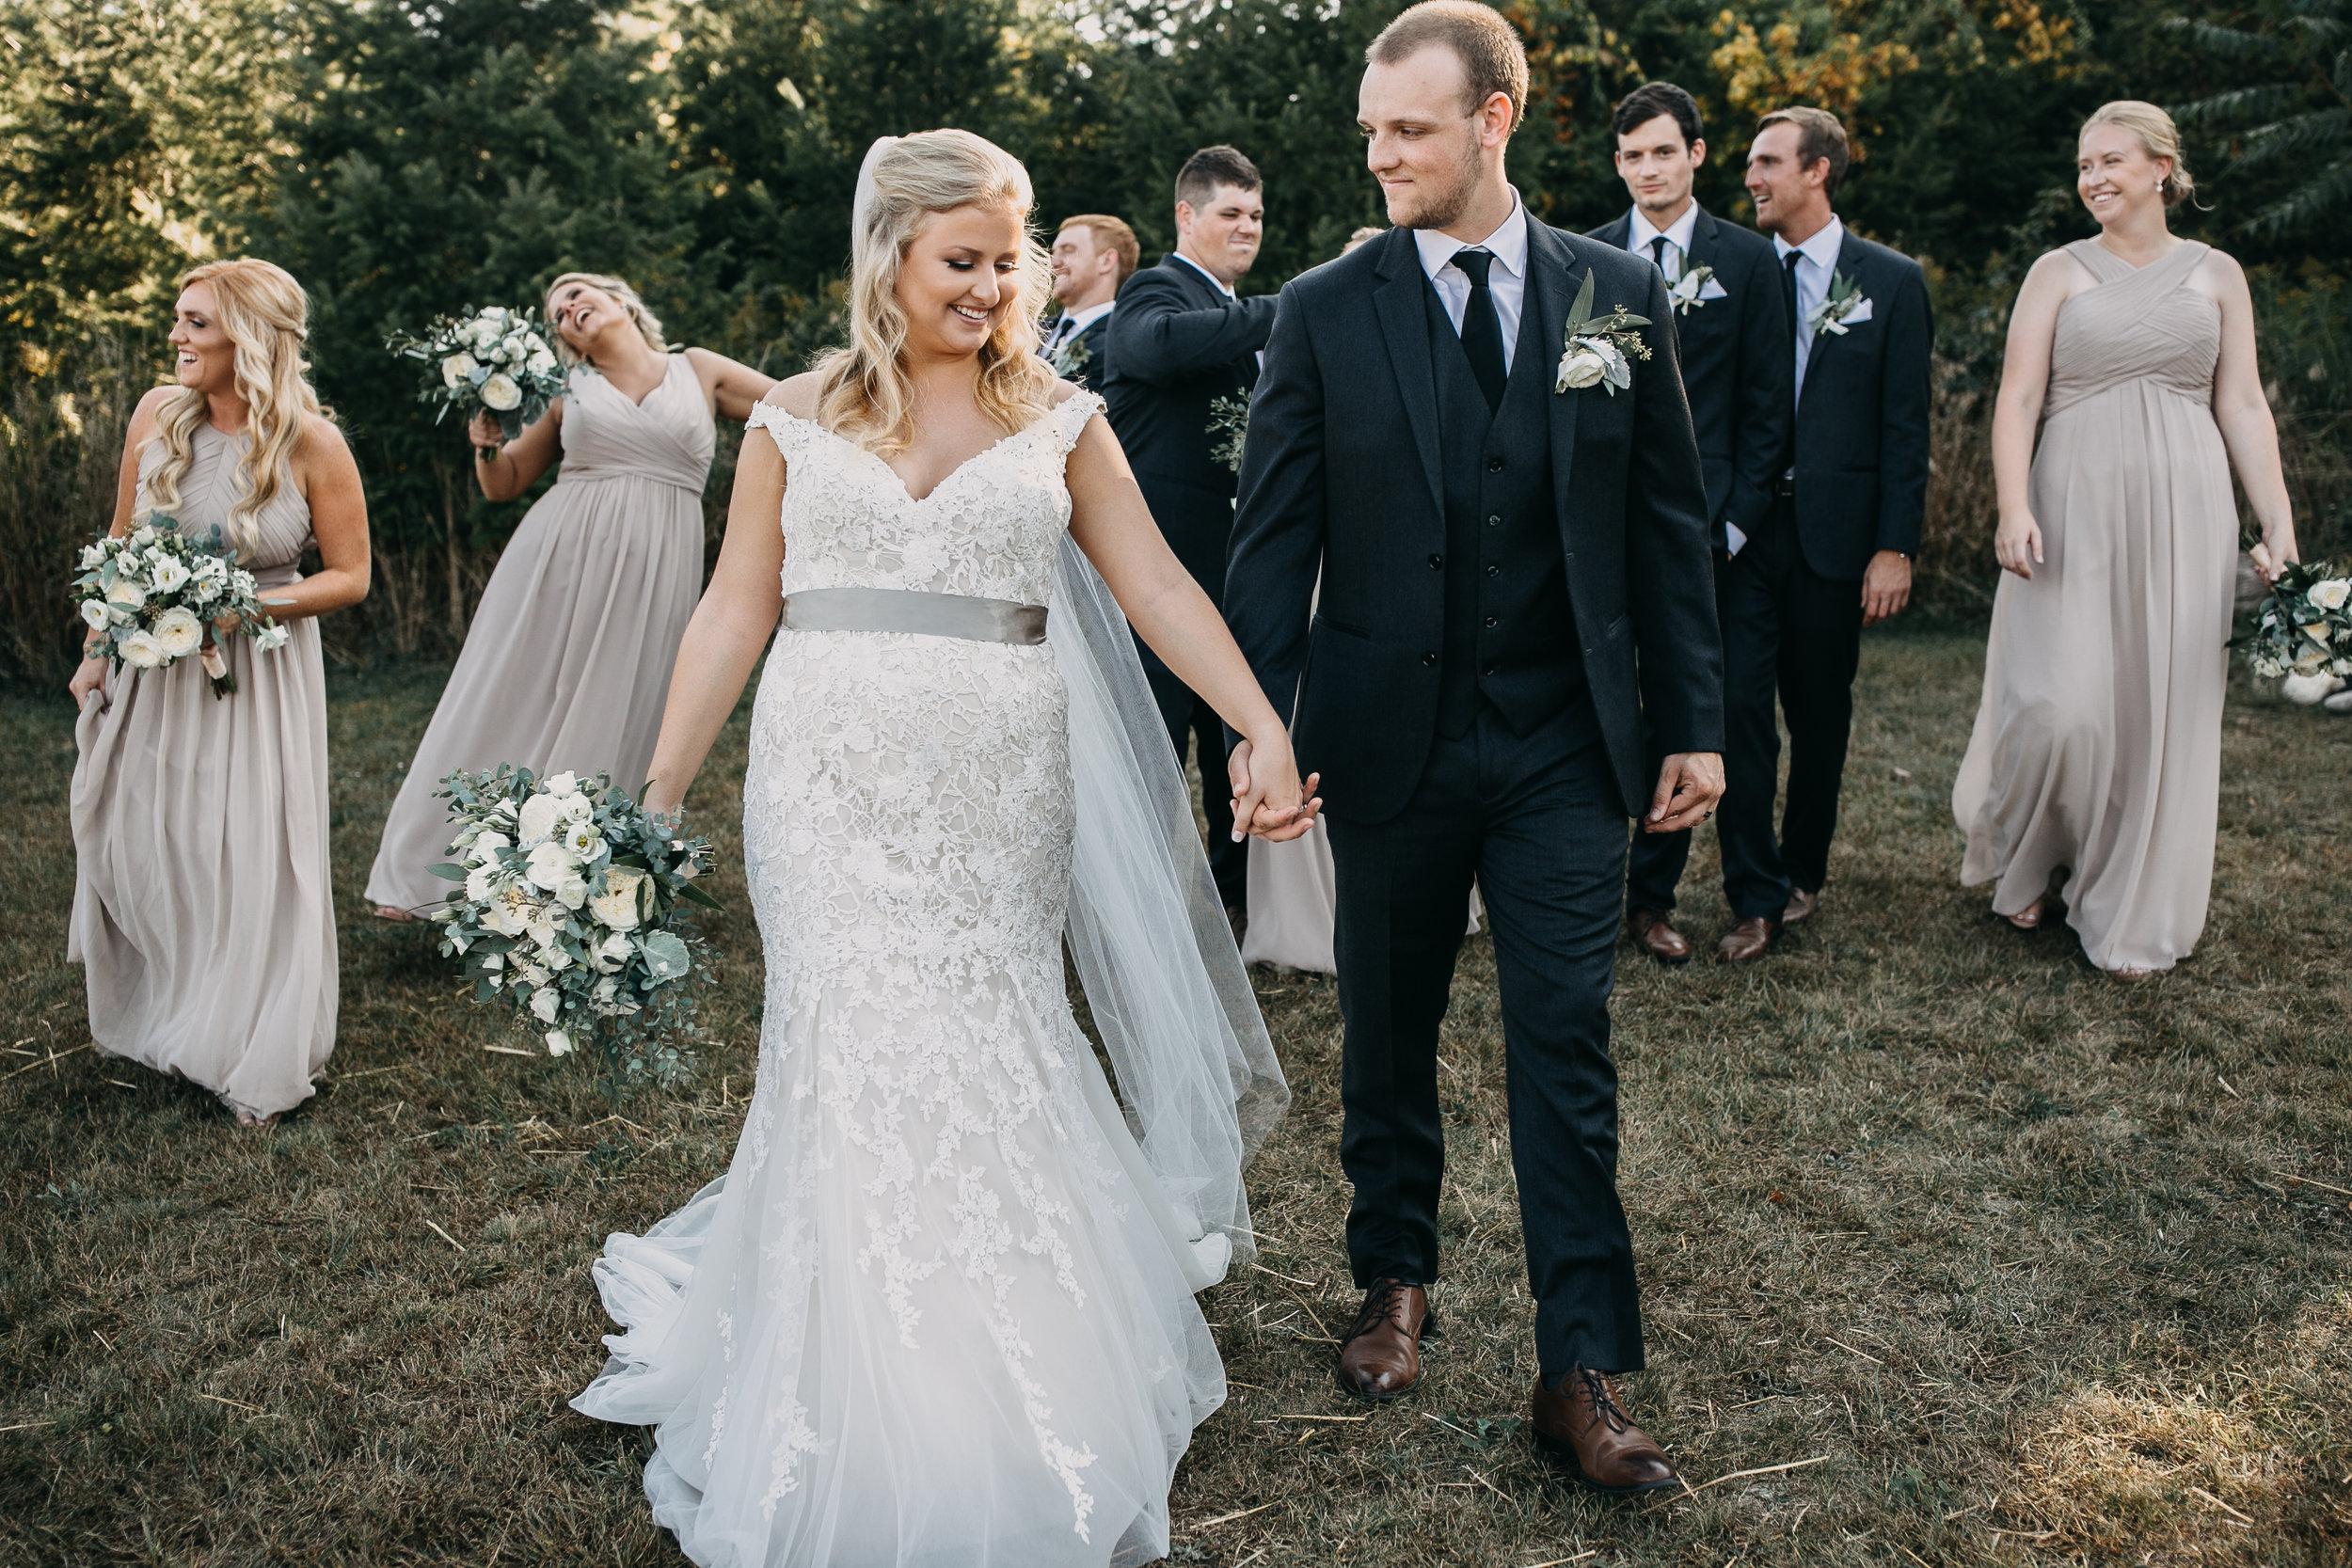 32 wedding party walking.jpg